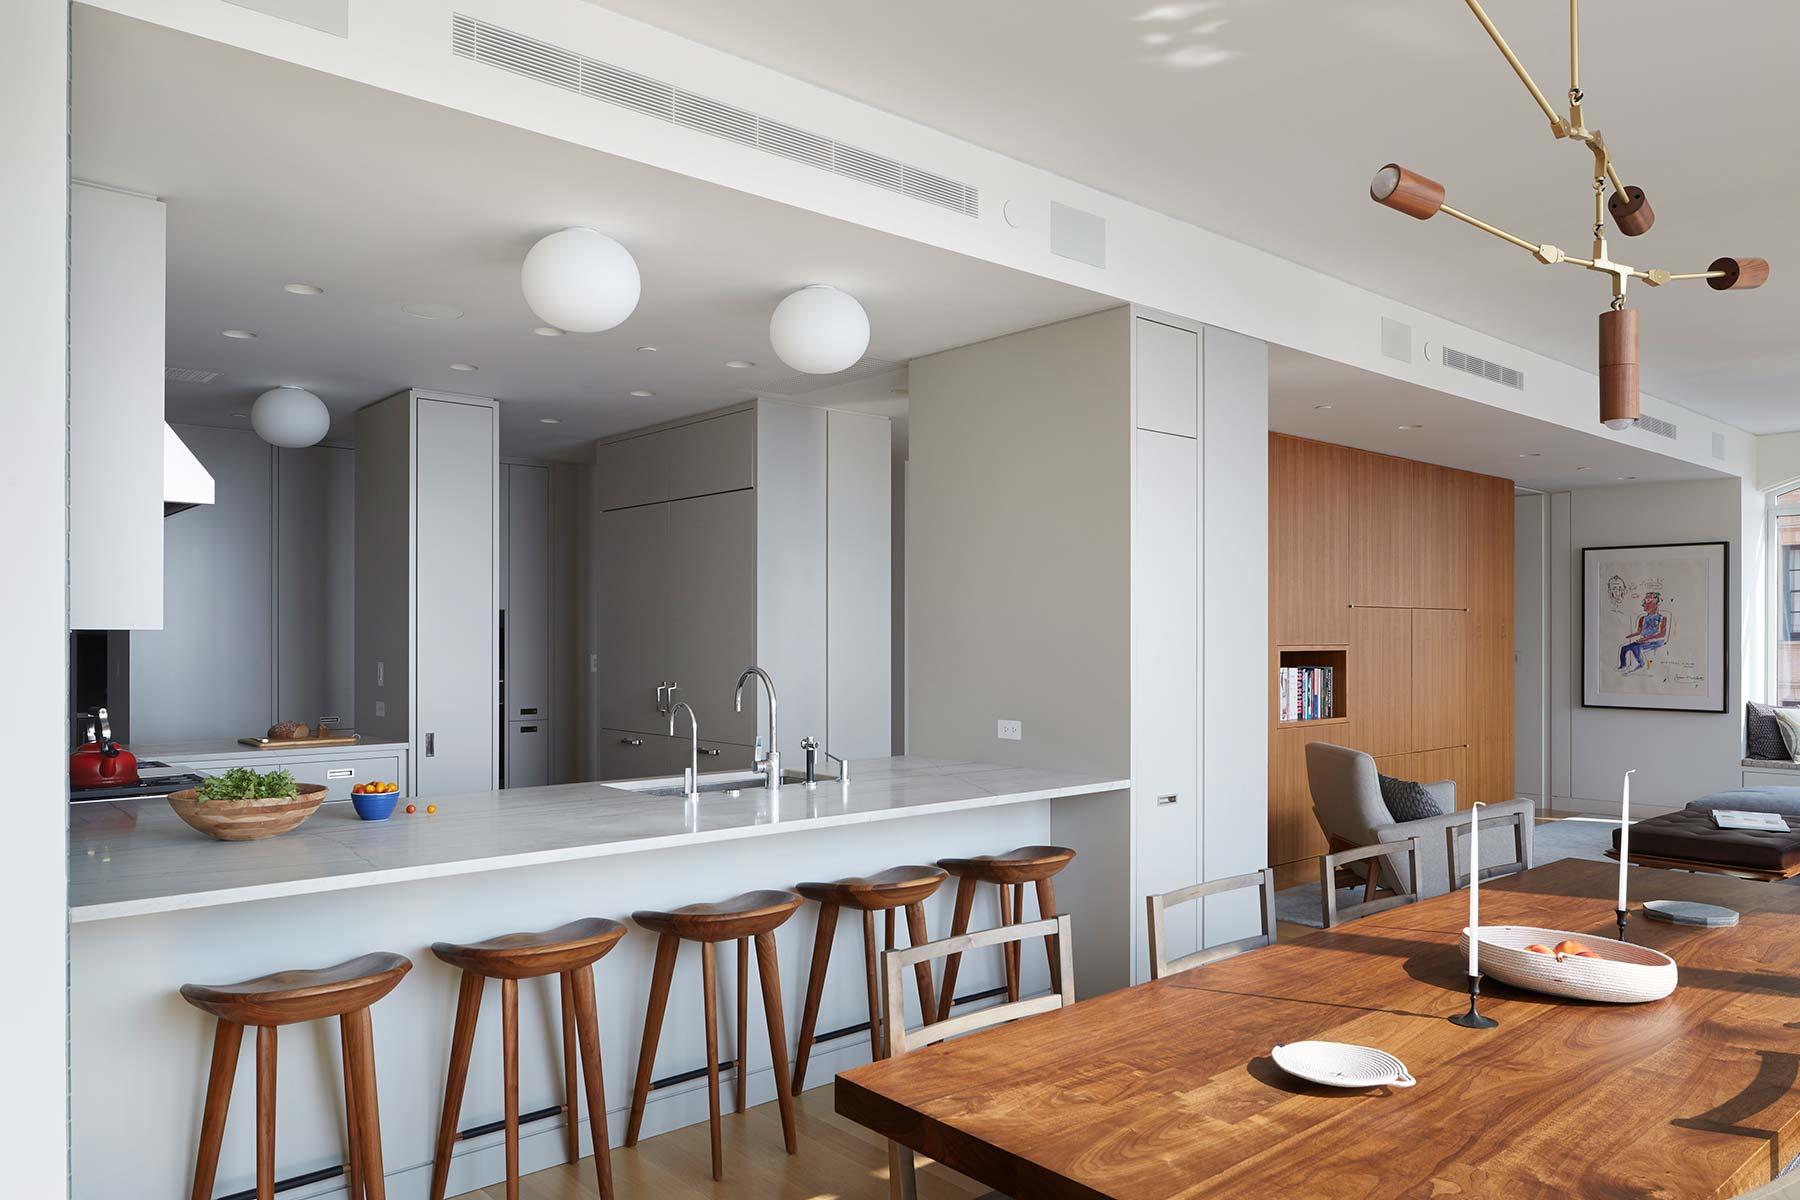 Pulltab design west village residence new york ny for Teich design west village